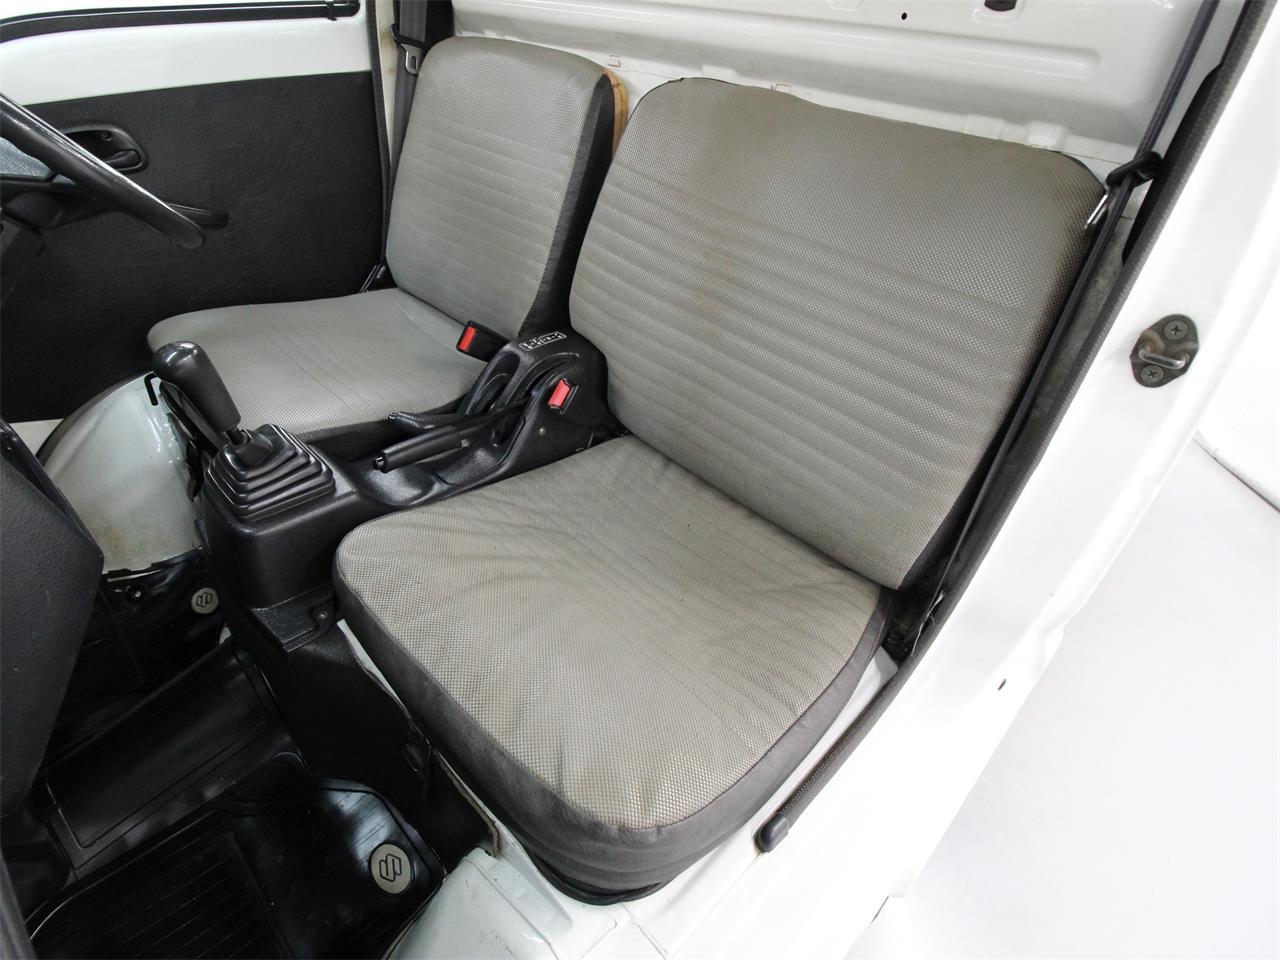 1995 Suzuki Carry (CC-1330524) for sale in Christiansburg, Virginia